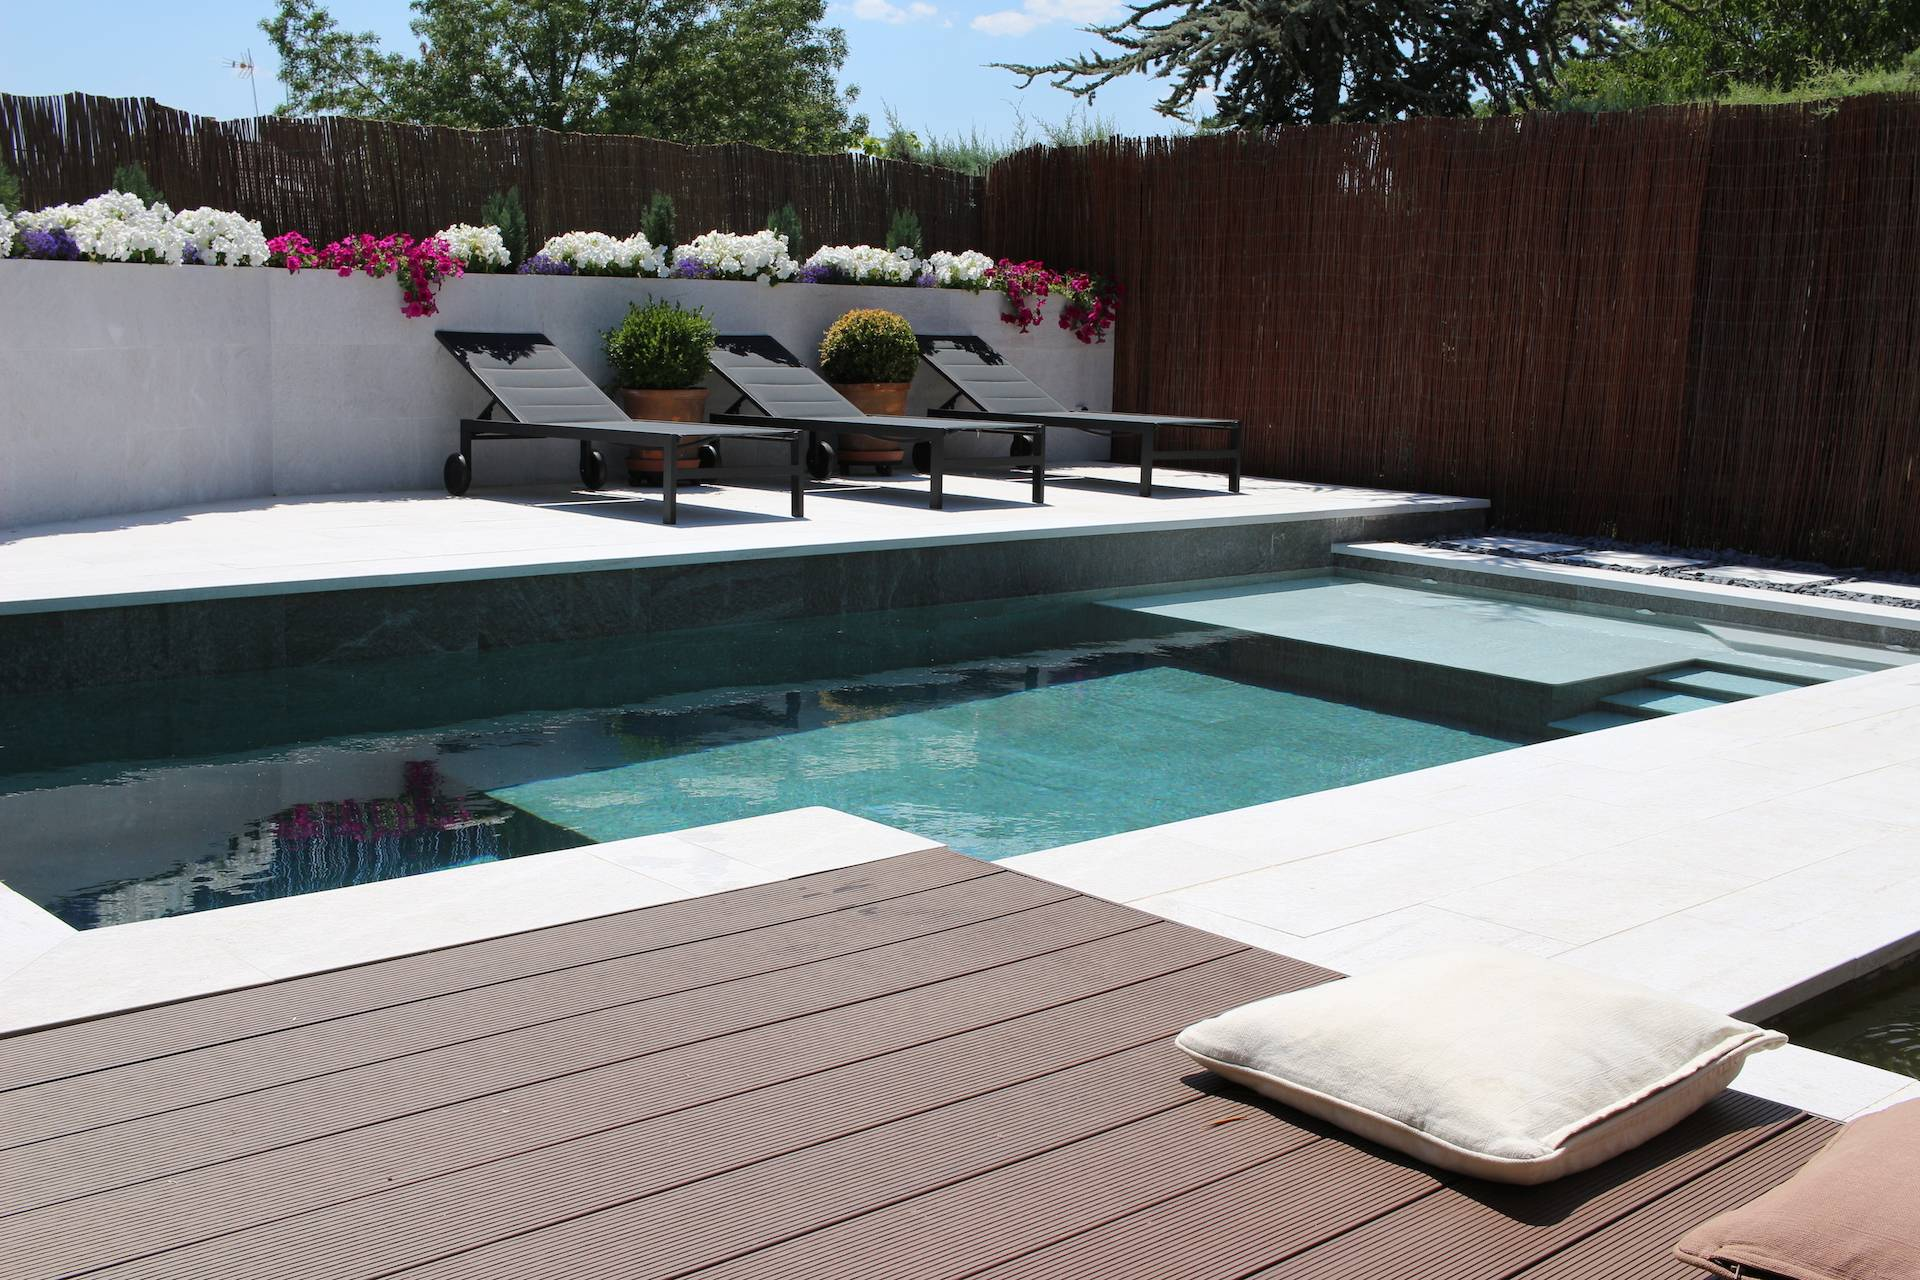 Pequeña piscina de diseño